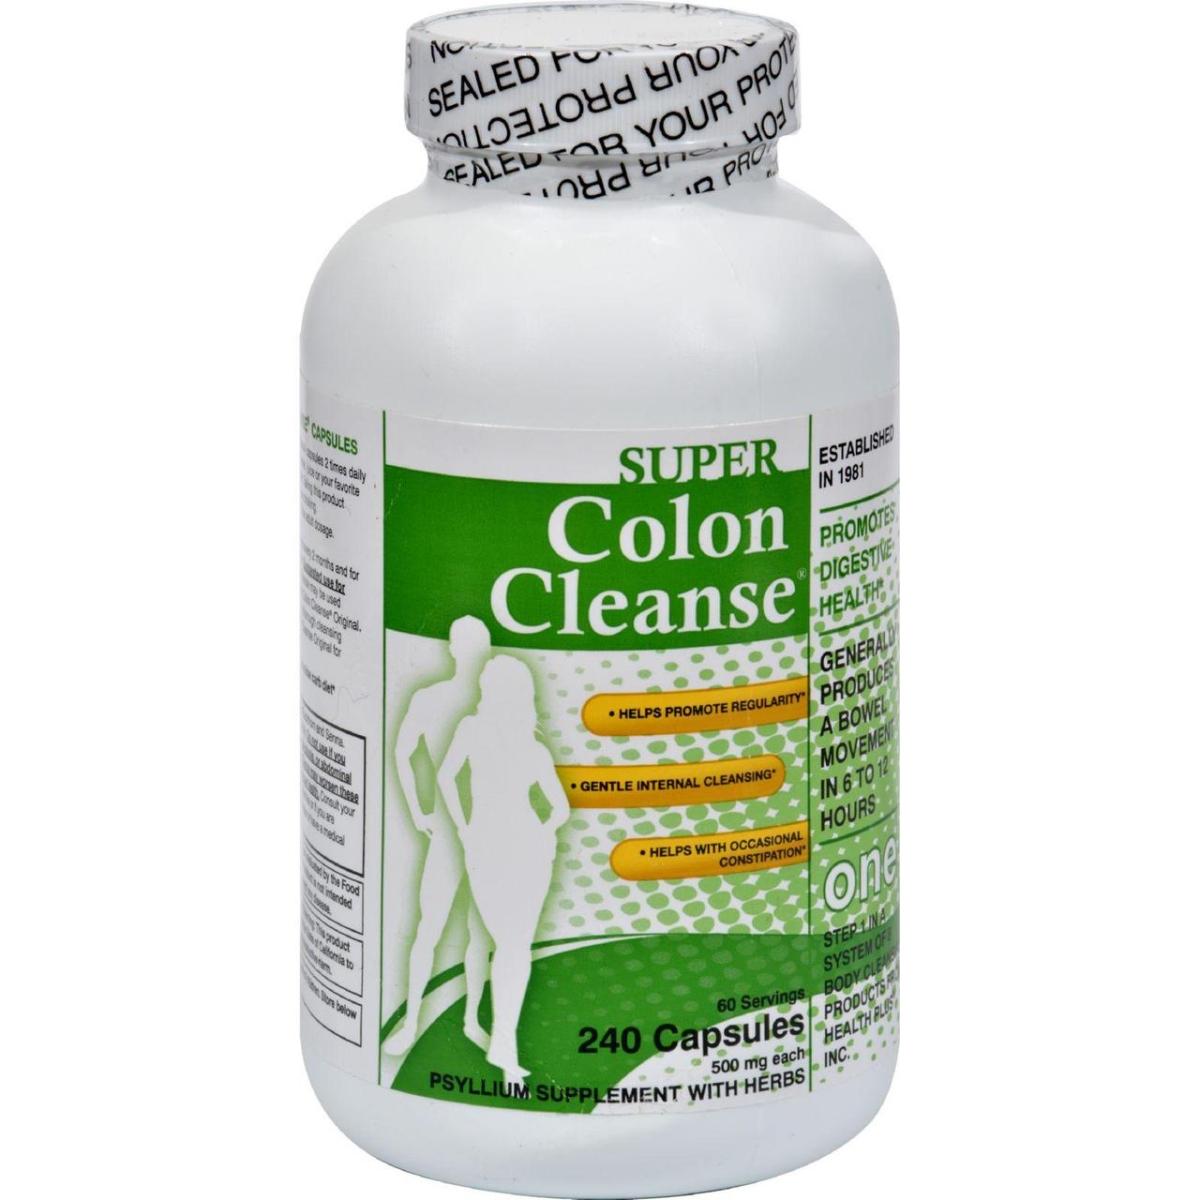 Health Plus HG0276642 500 mg Super Colon Cleanse - 240 Capsules